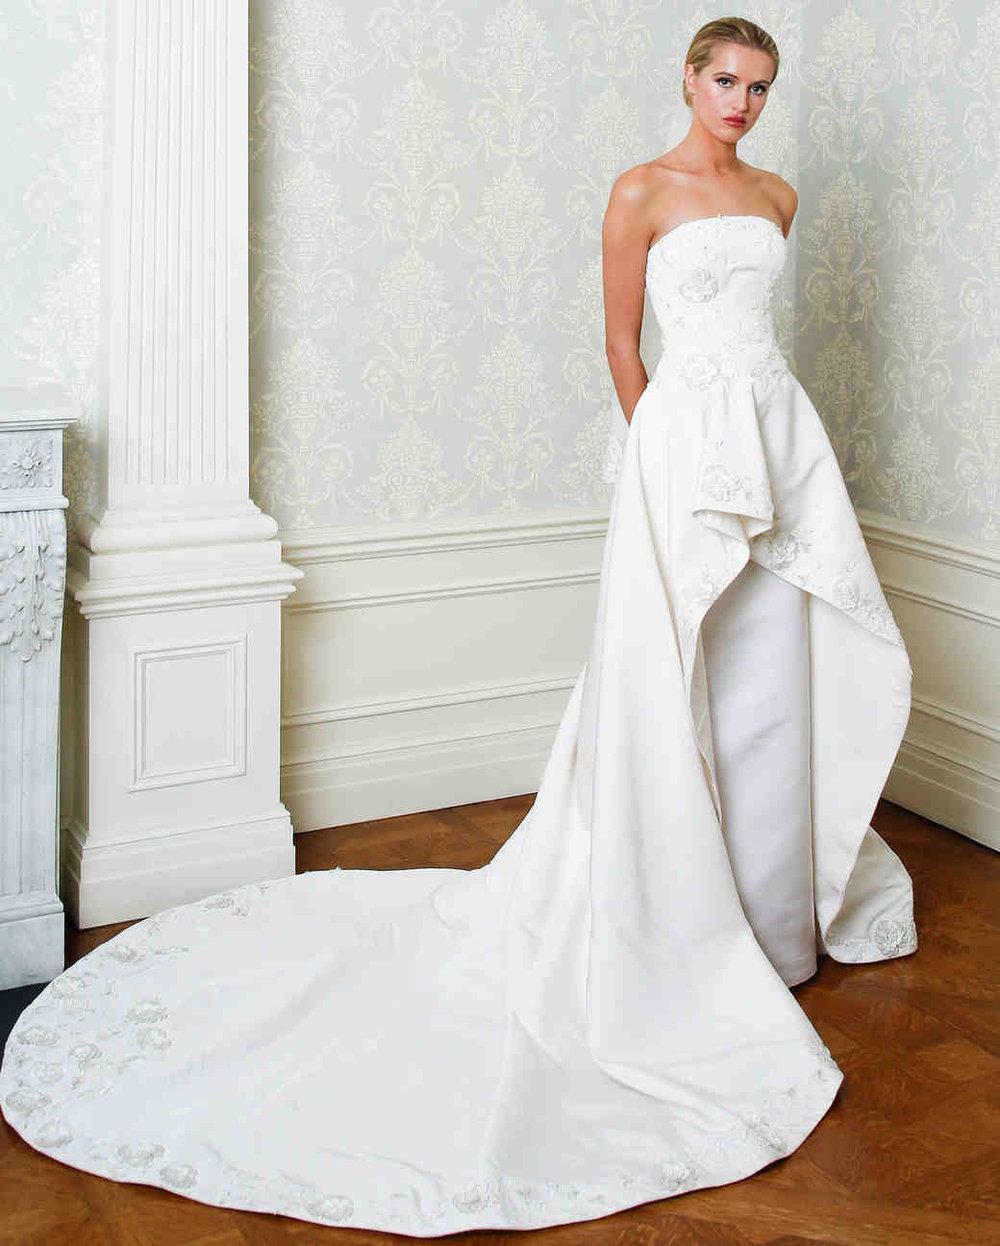 cristina-ottaviano-dress-spring2019-06_vert.jpg